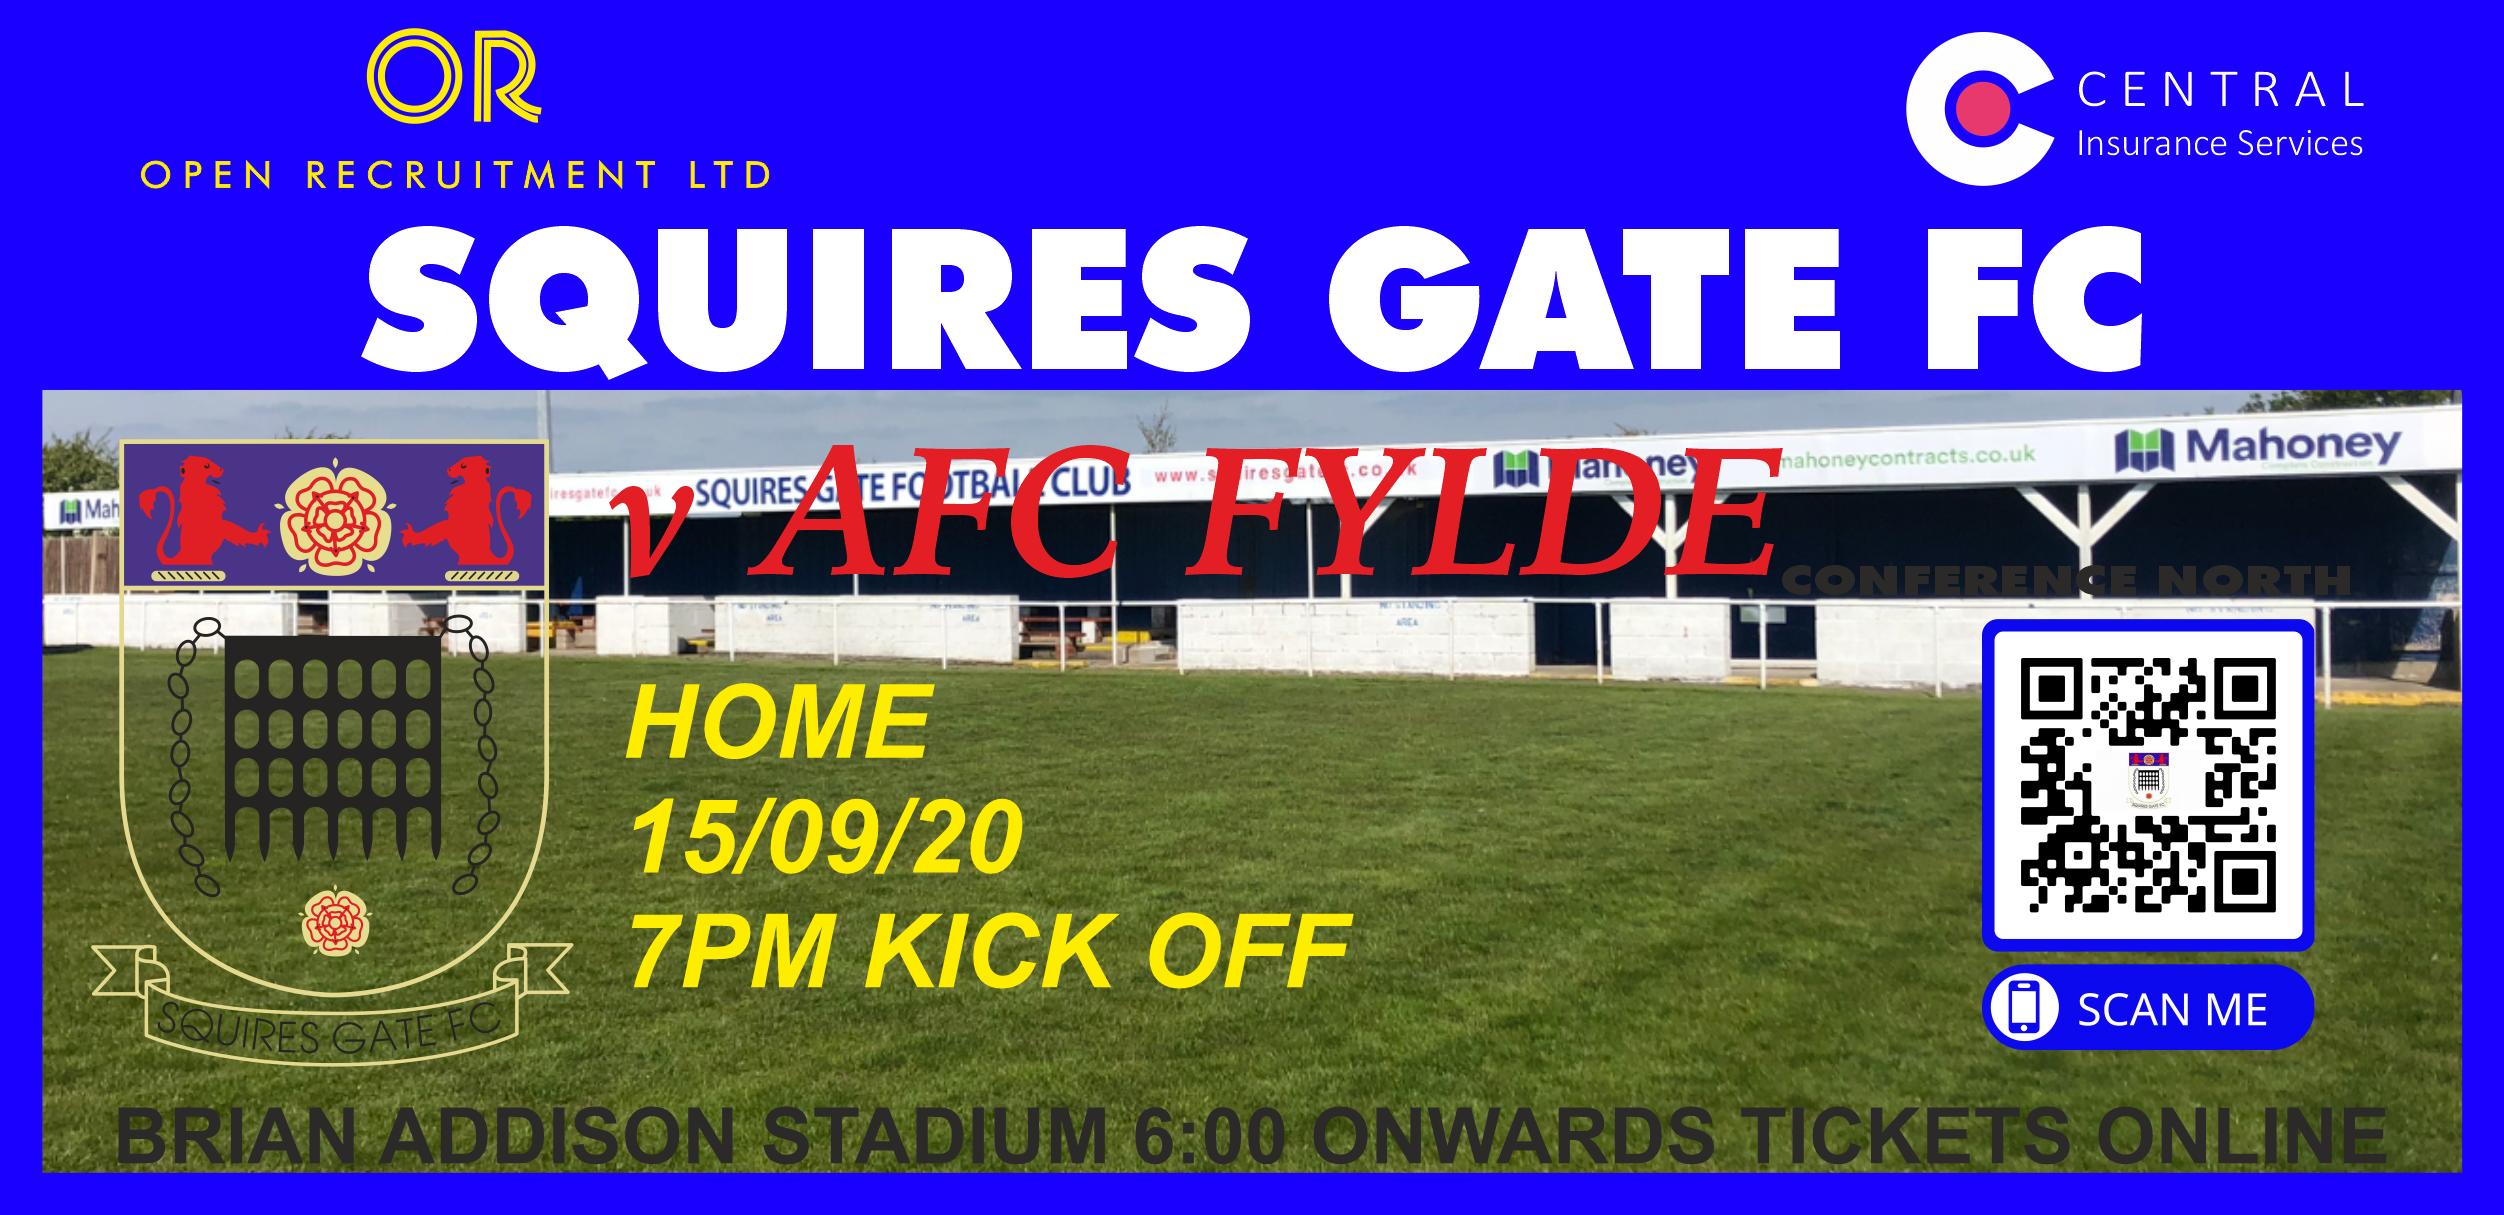 AFC Fylde Match Day Tickets